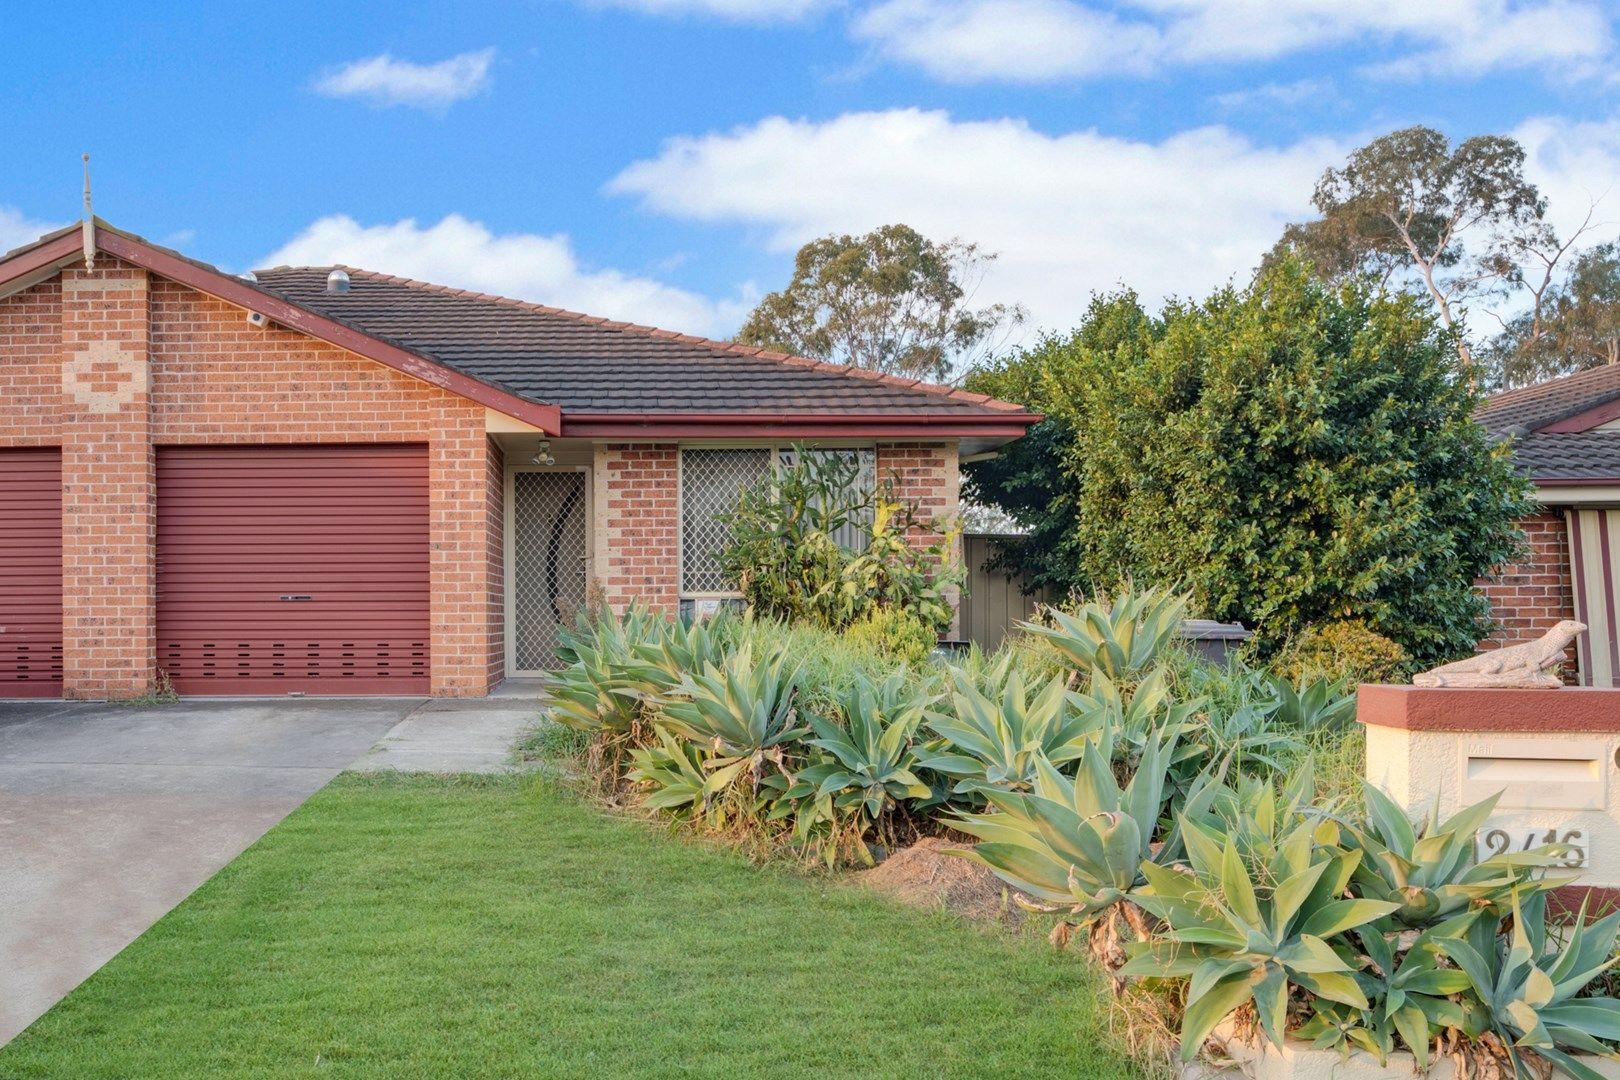 2/16 Azalea Place, Macquarie Fields NSW 2564, Image 0